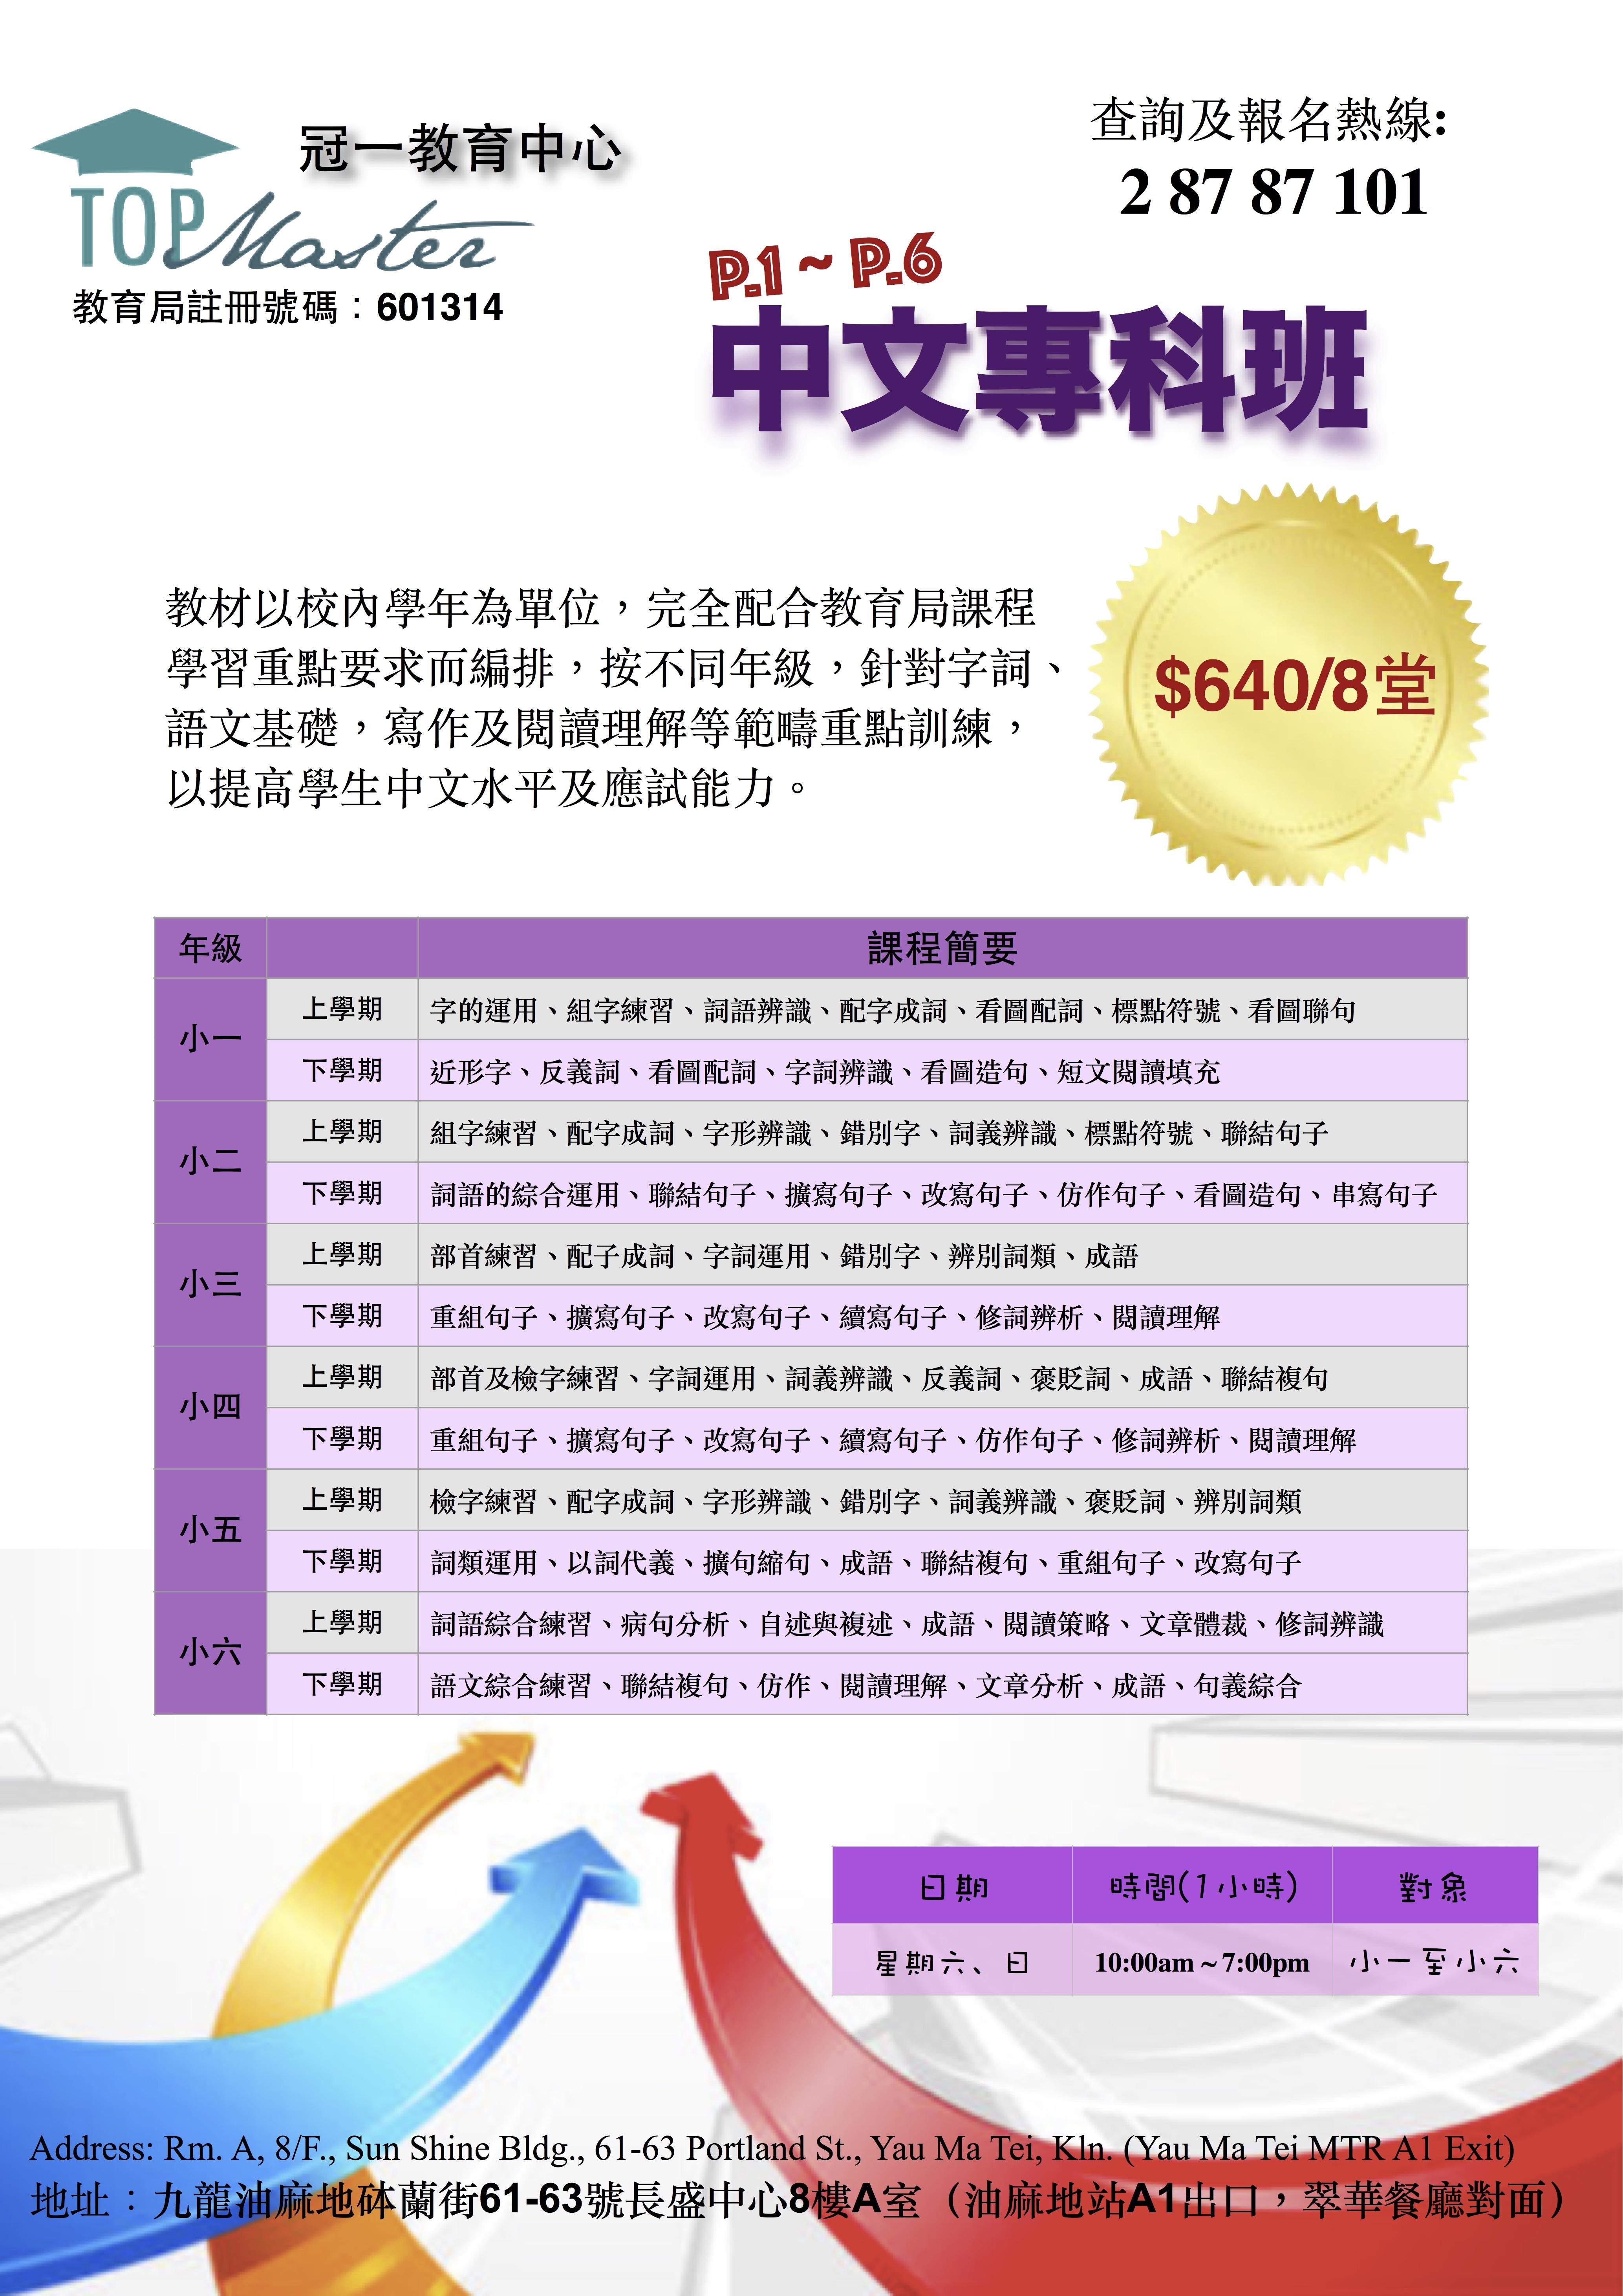 中文專科班 | Top Master Education Center 冠一教育中心